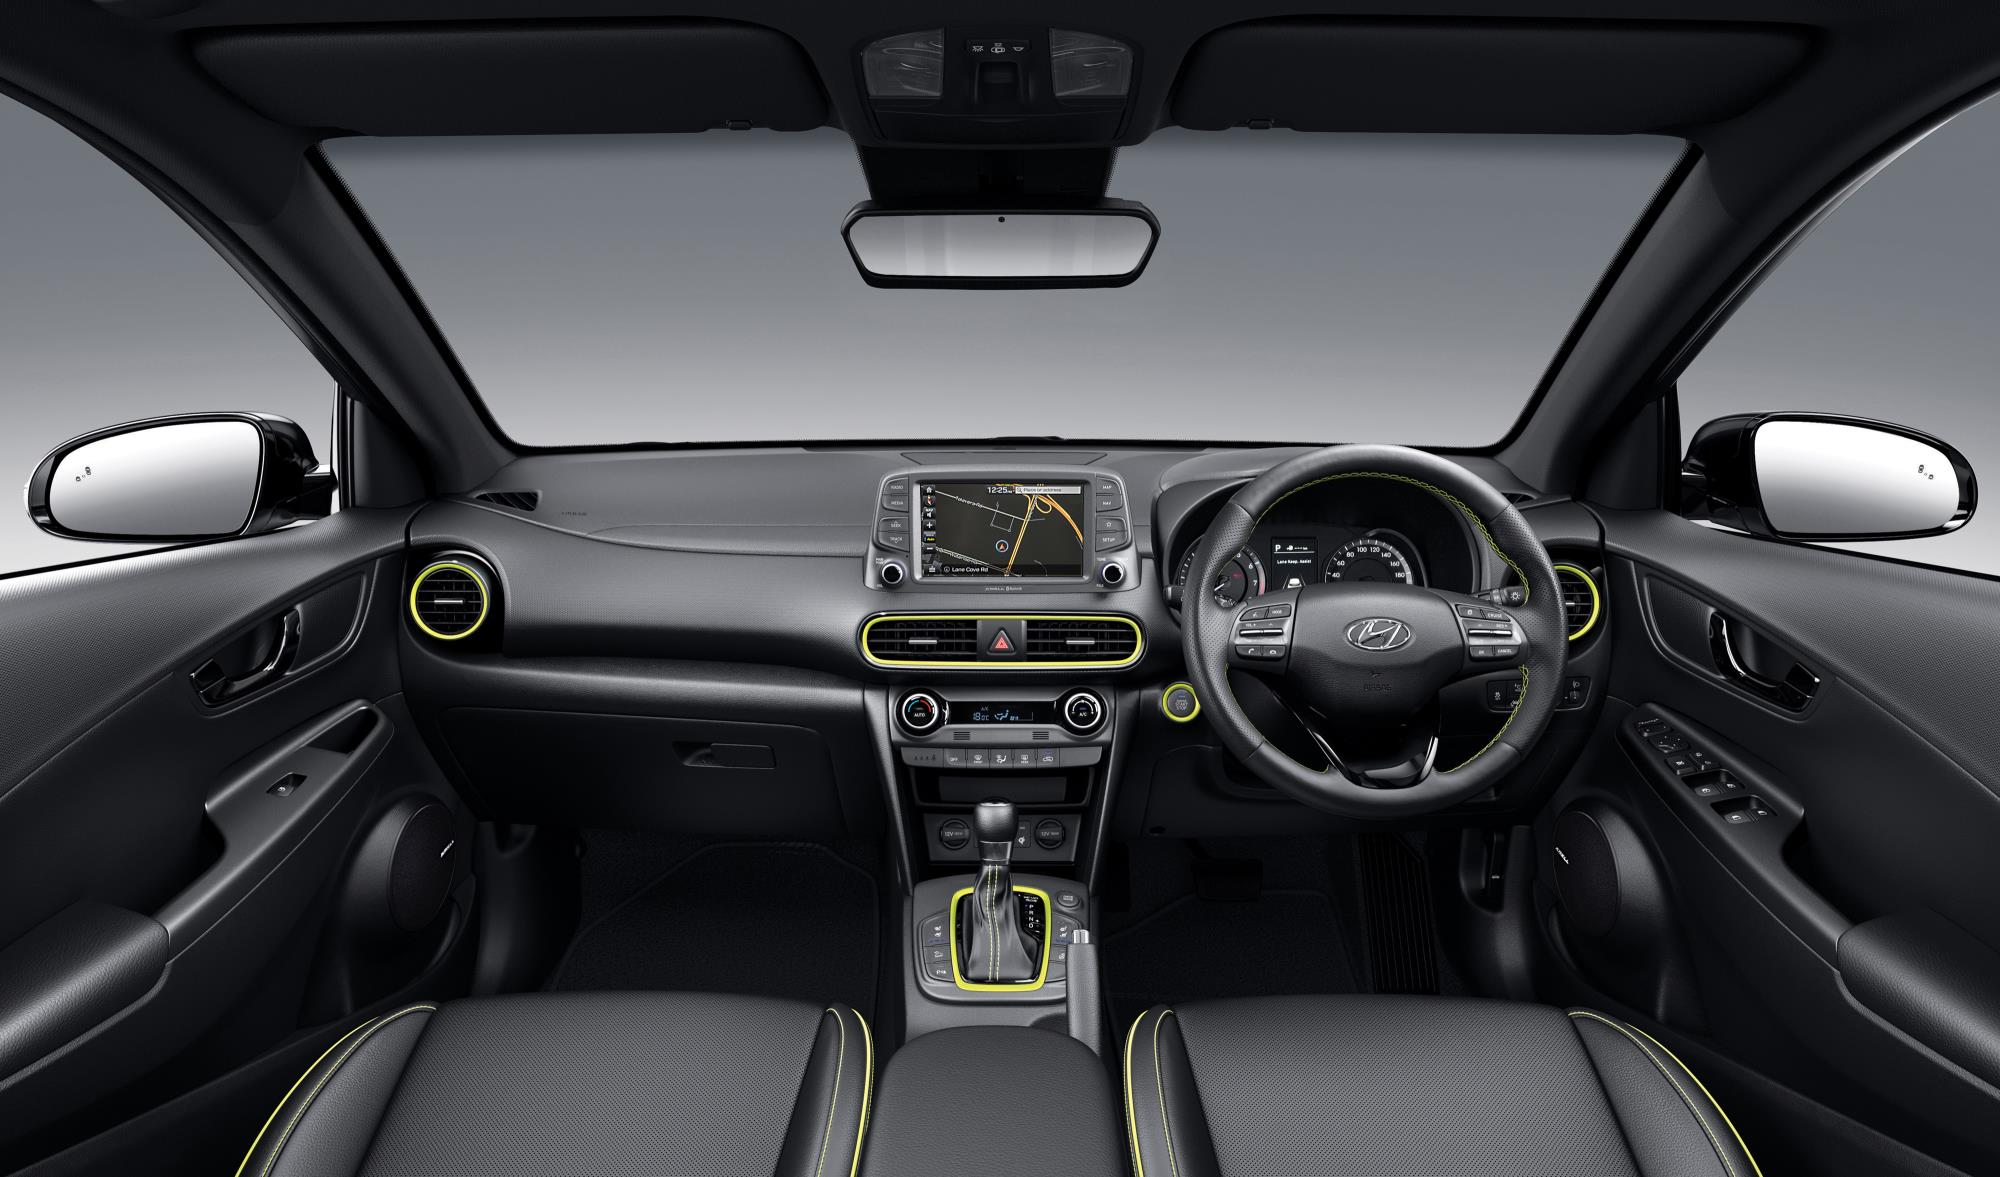 2019 Hyundai Kona Update Now On Sale In Australia